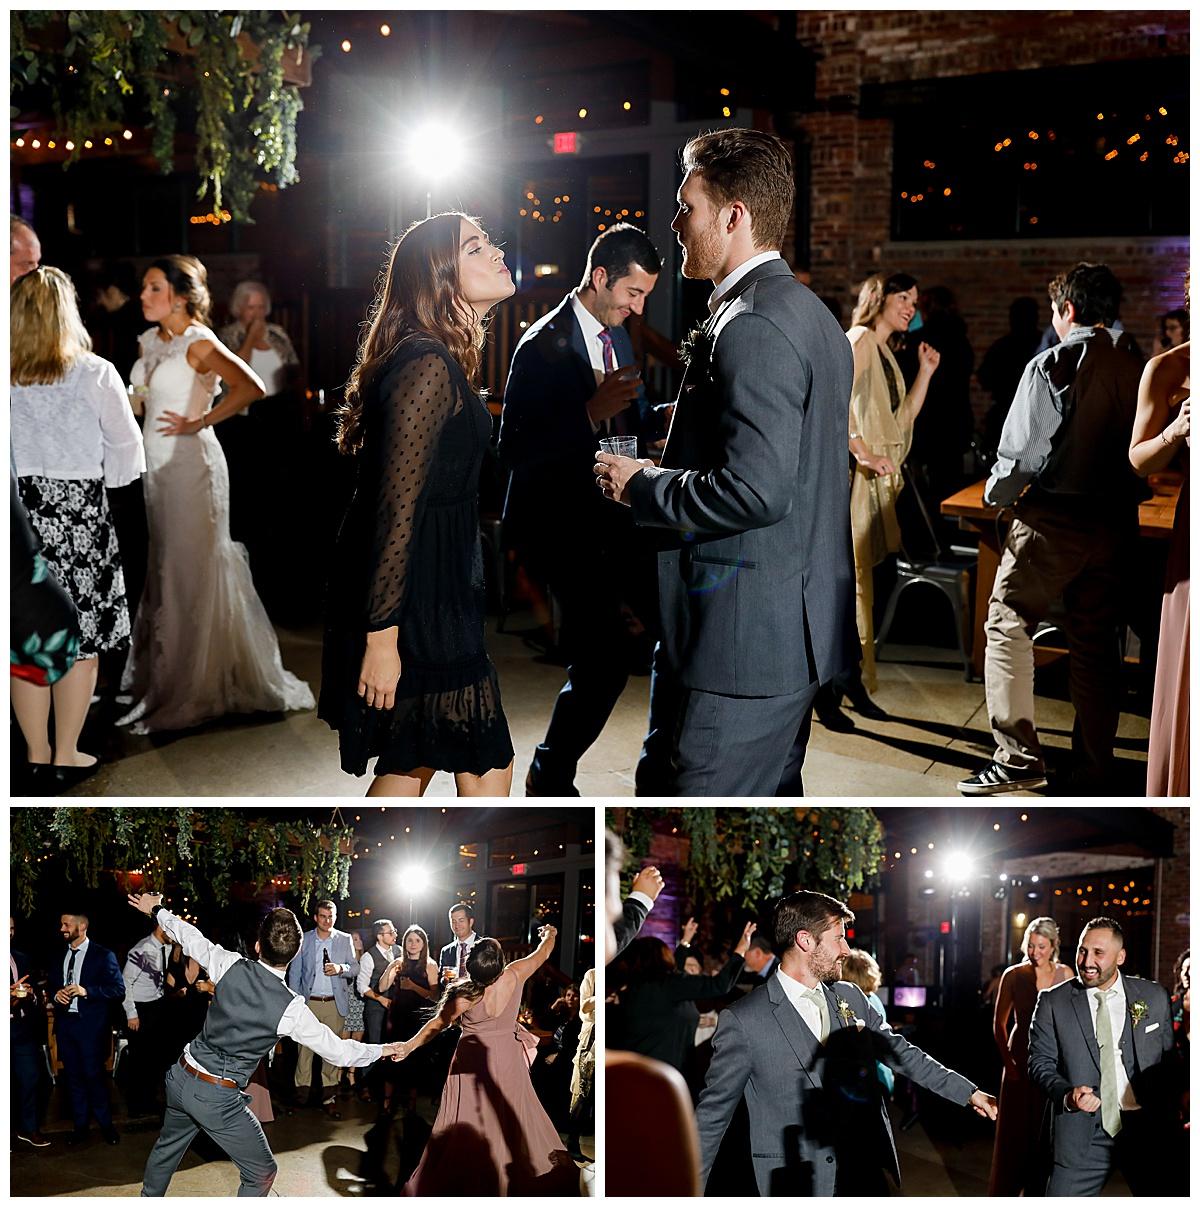 INDUSTRY_Indianapolis_Meghan Harrison Wedding Photography_0055.jpg